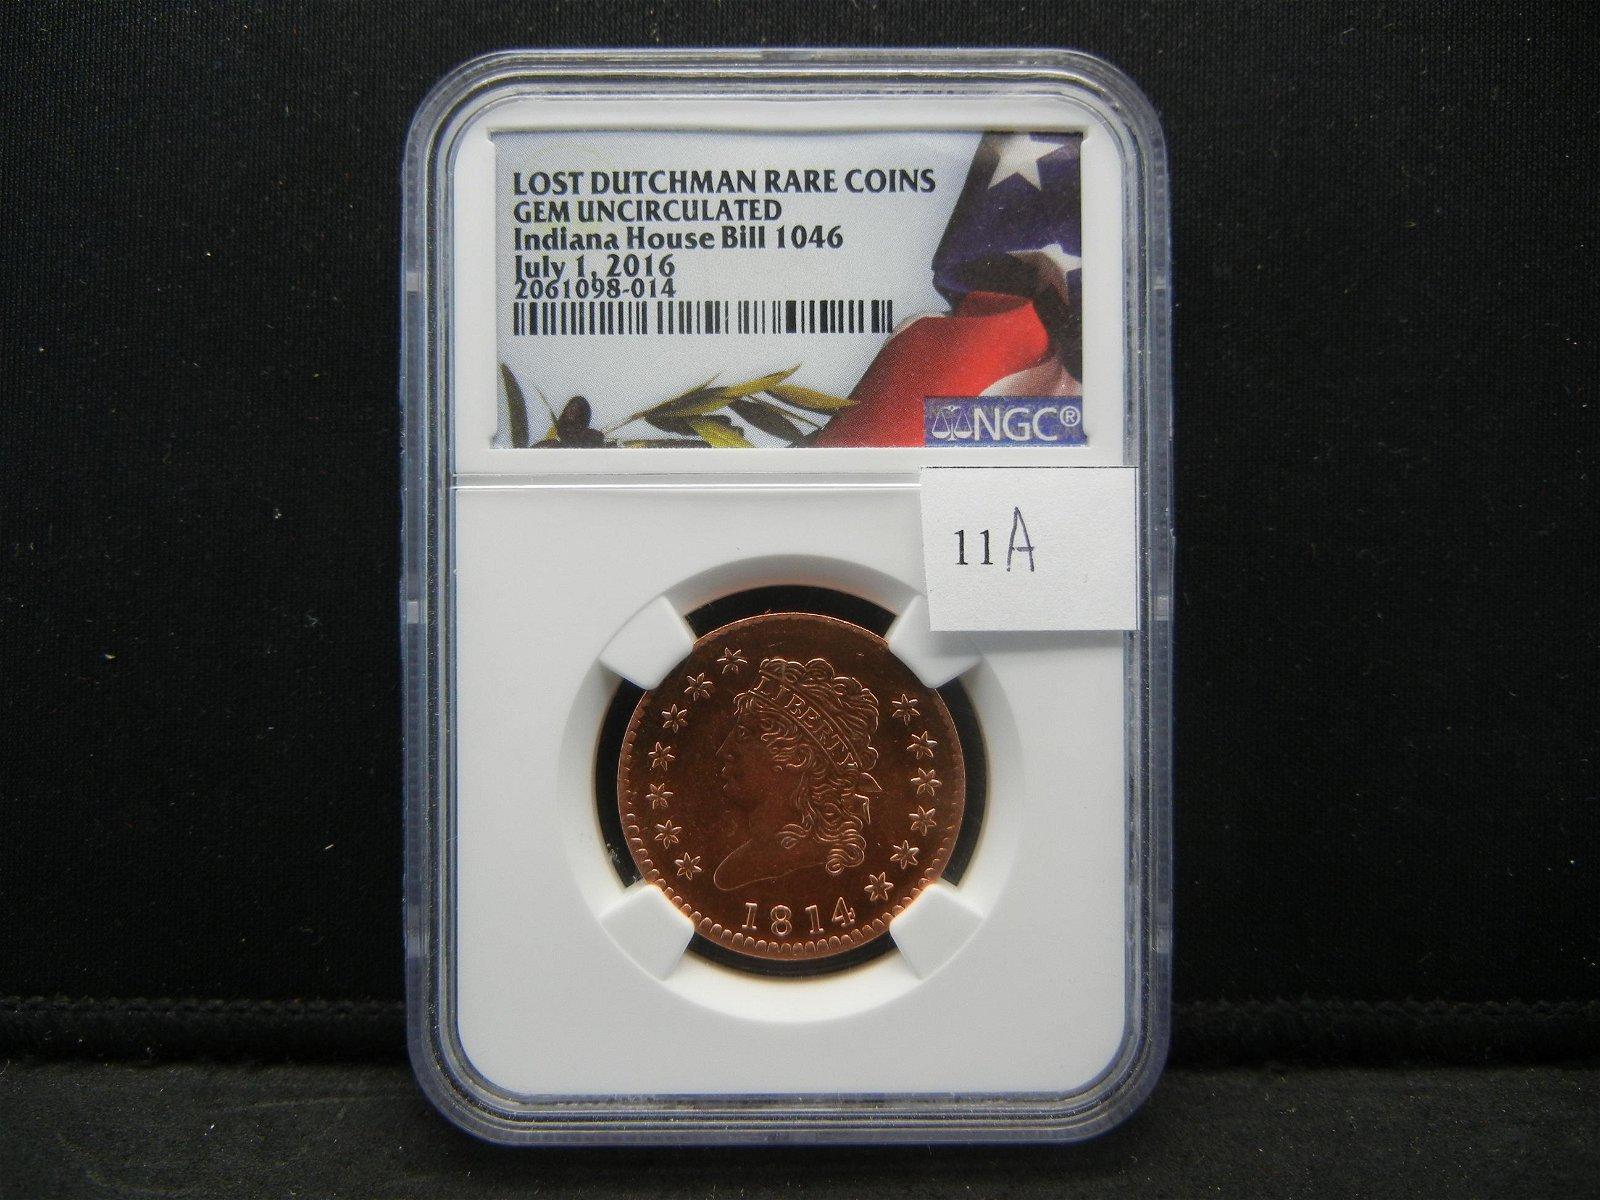 Lost Dutchman Rare Coins Gem Unc Commemorative Coin